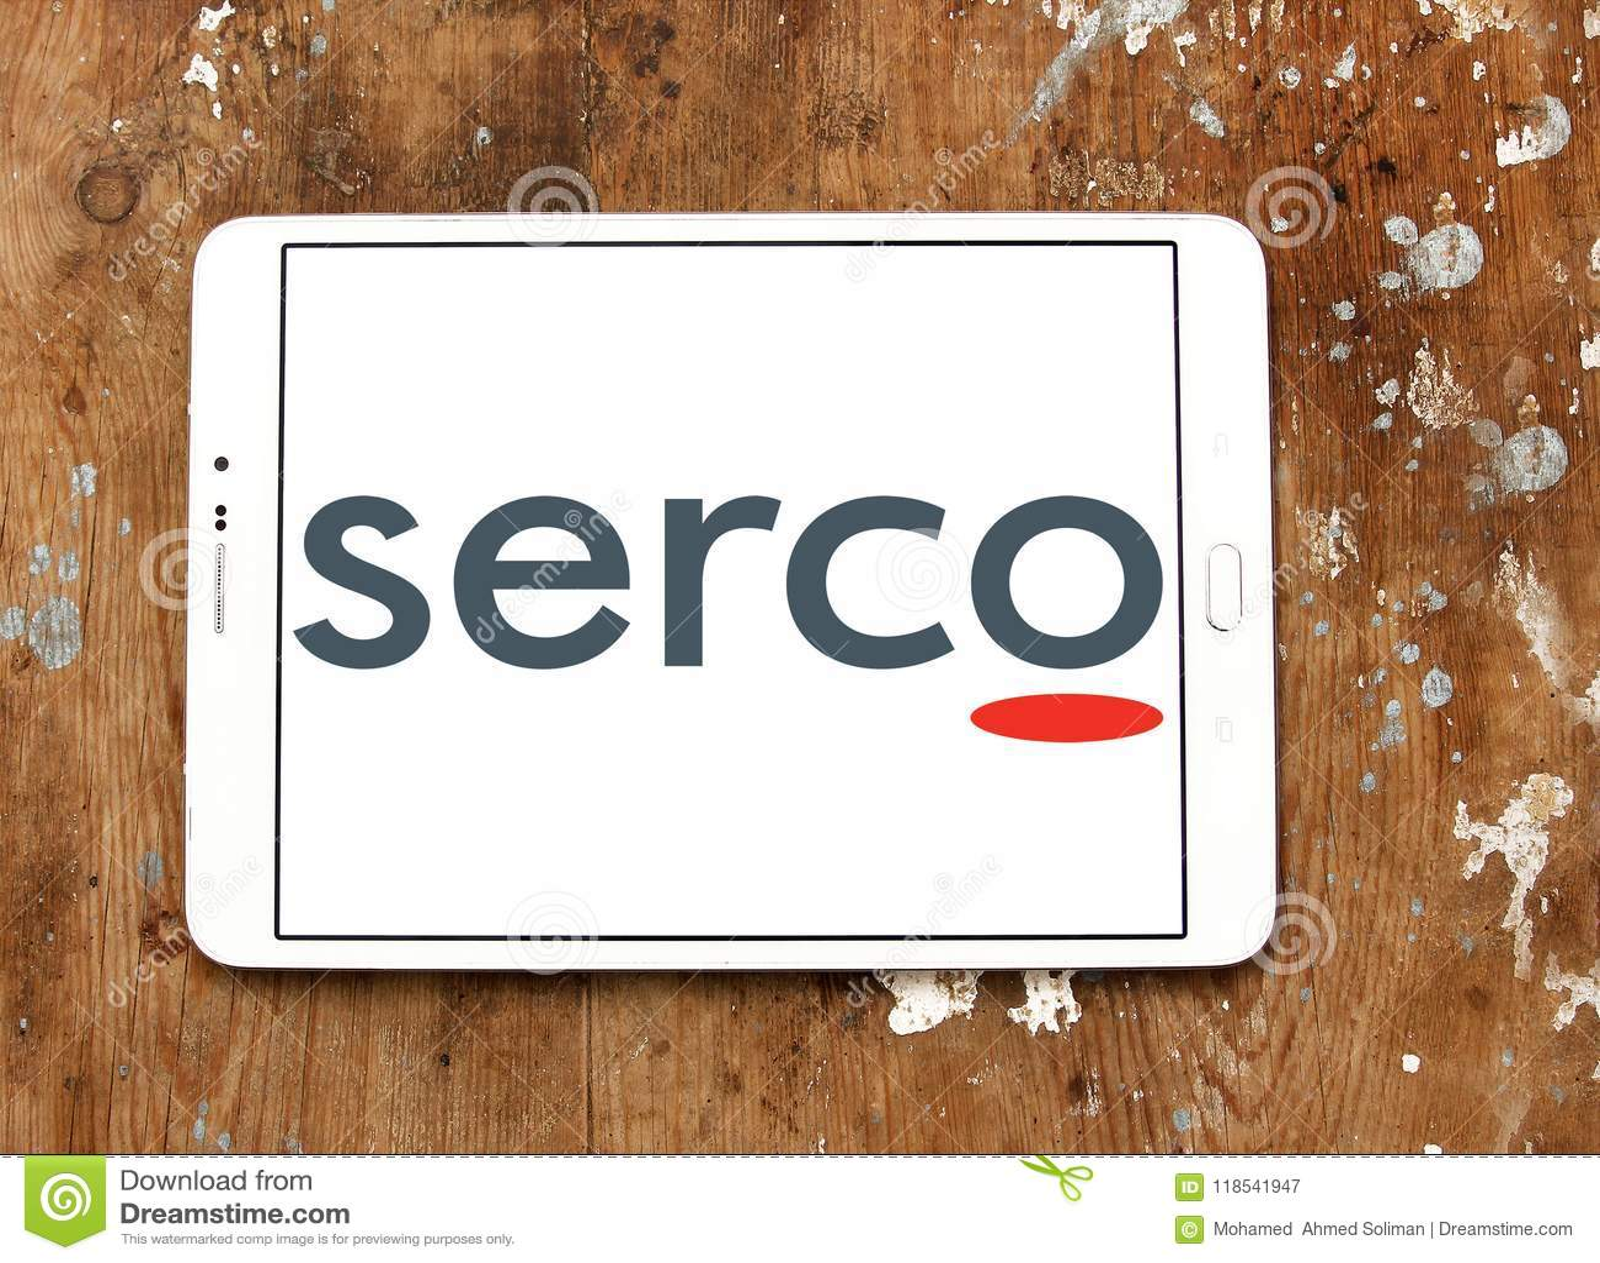 Serco public services company logo editorial photography image.